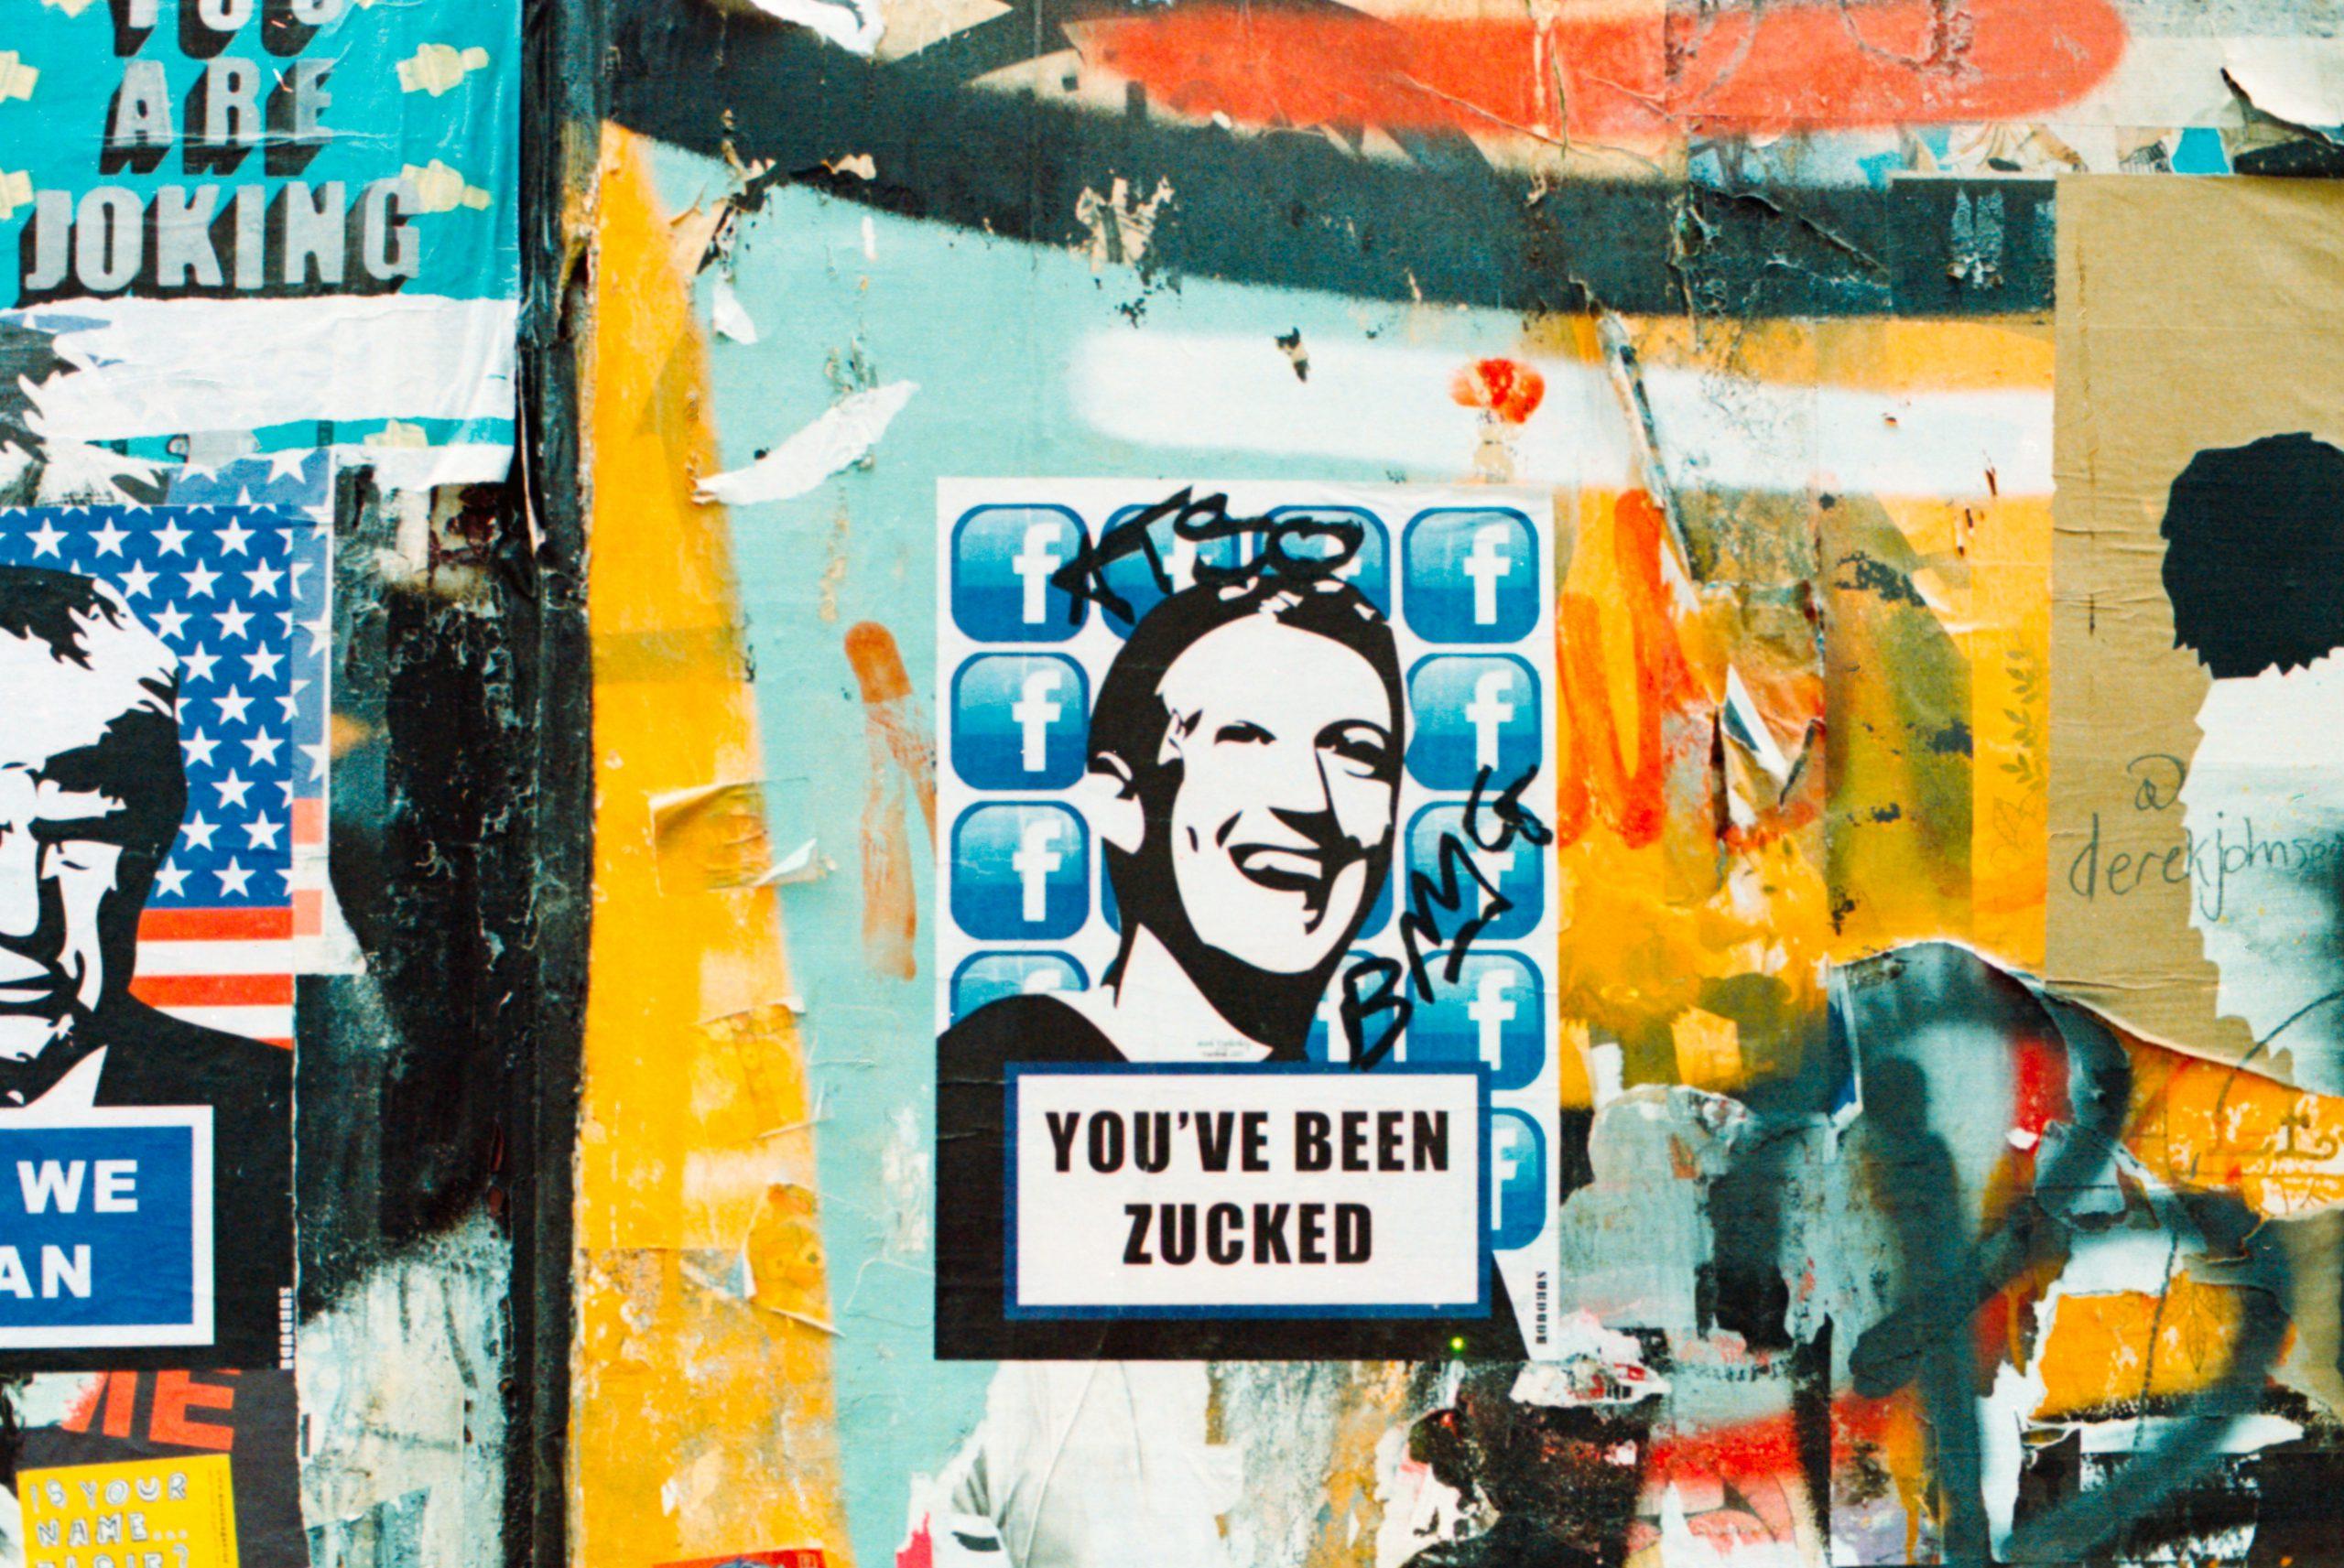 Mark Zuckerberg street art